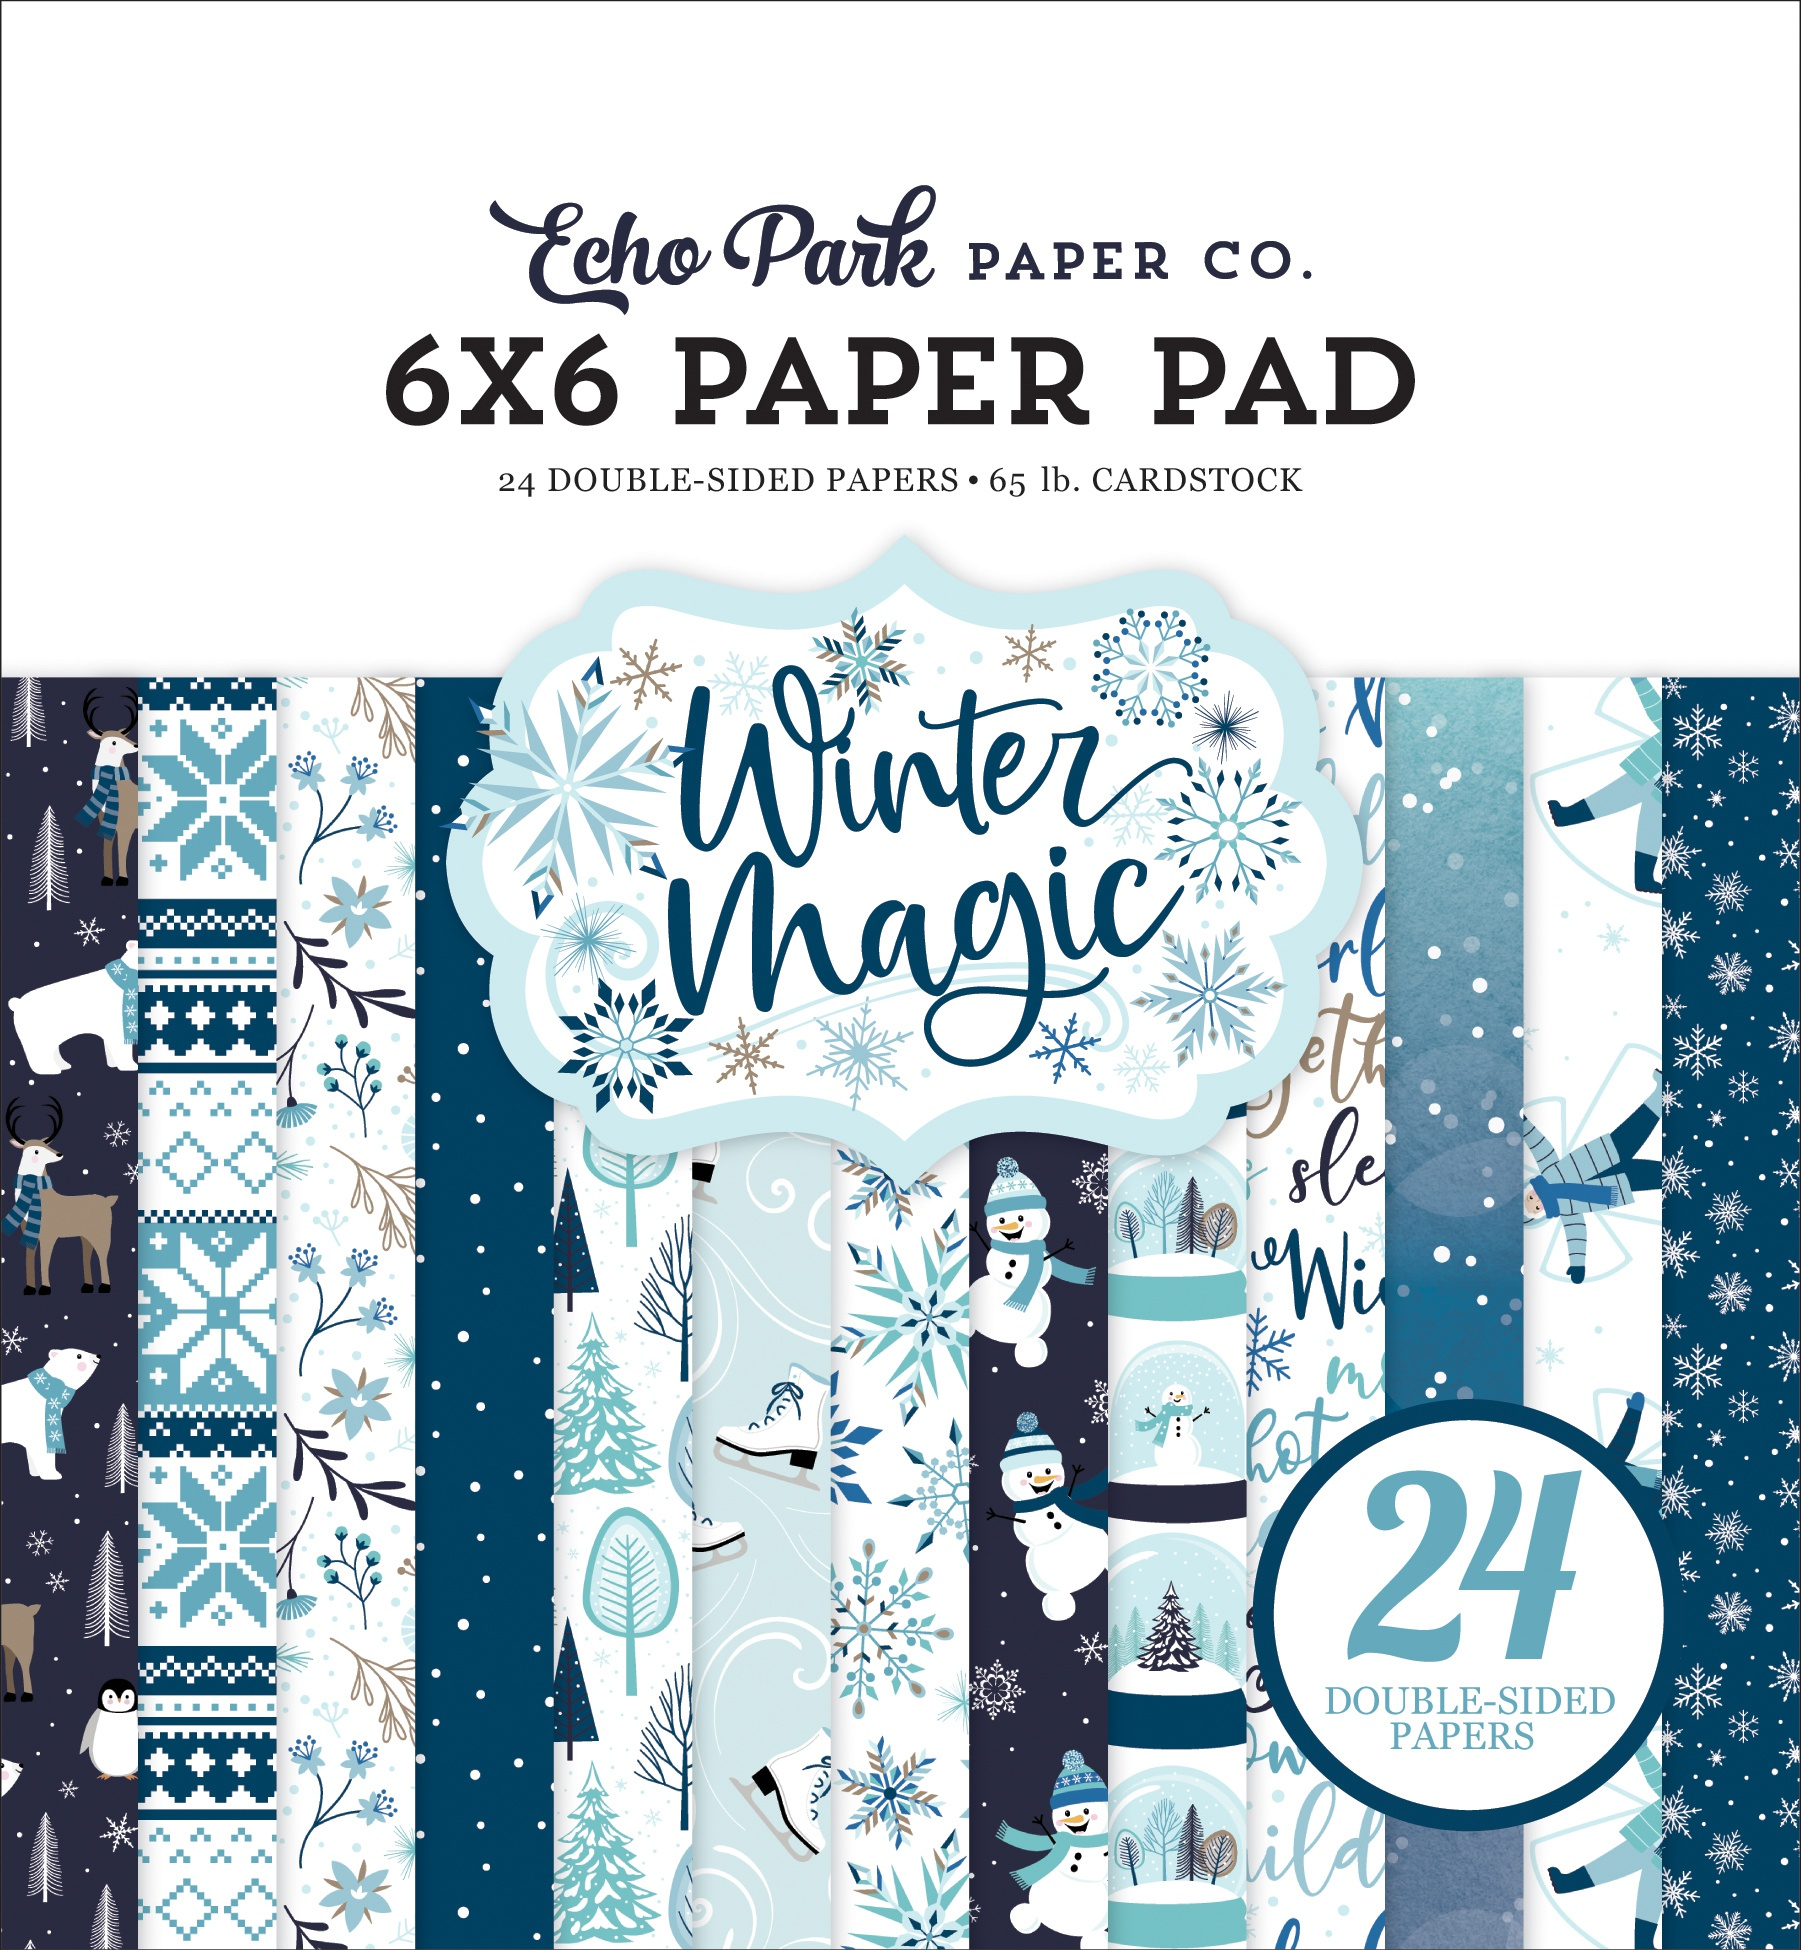 Echo Park Double-Sided Paper Pad 6X6 24/Pkg-Winter Magic